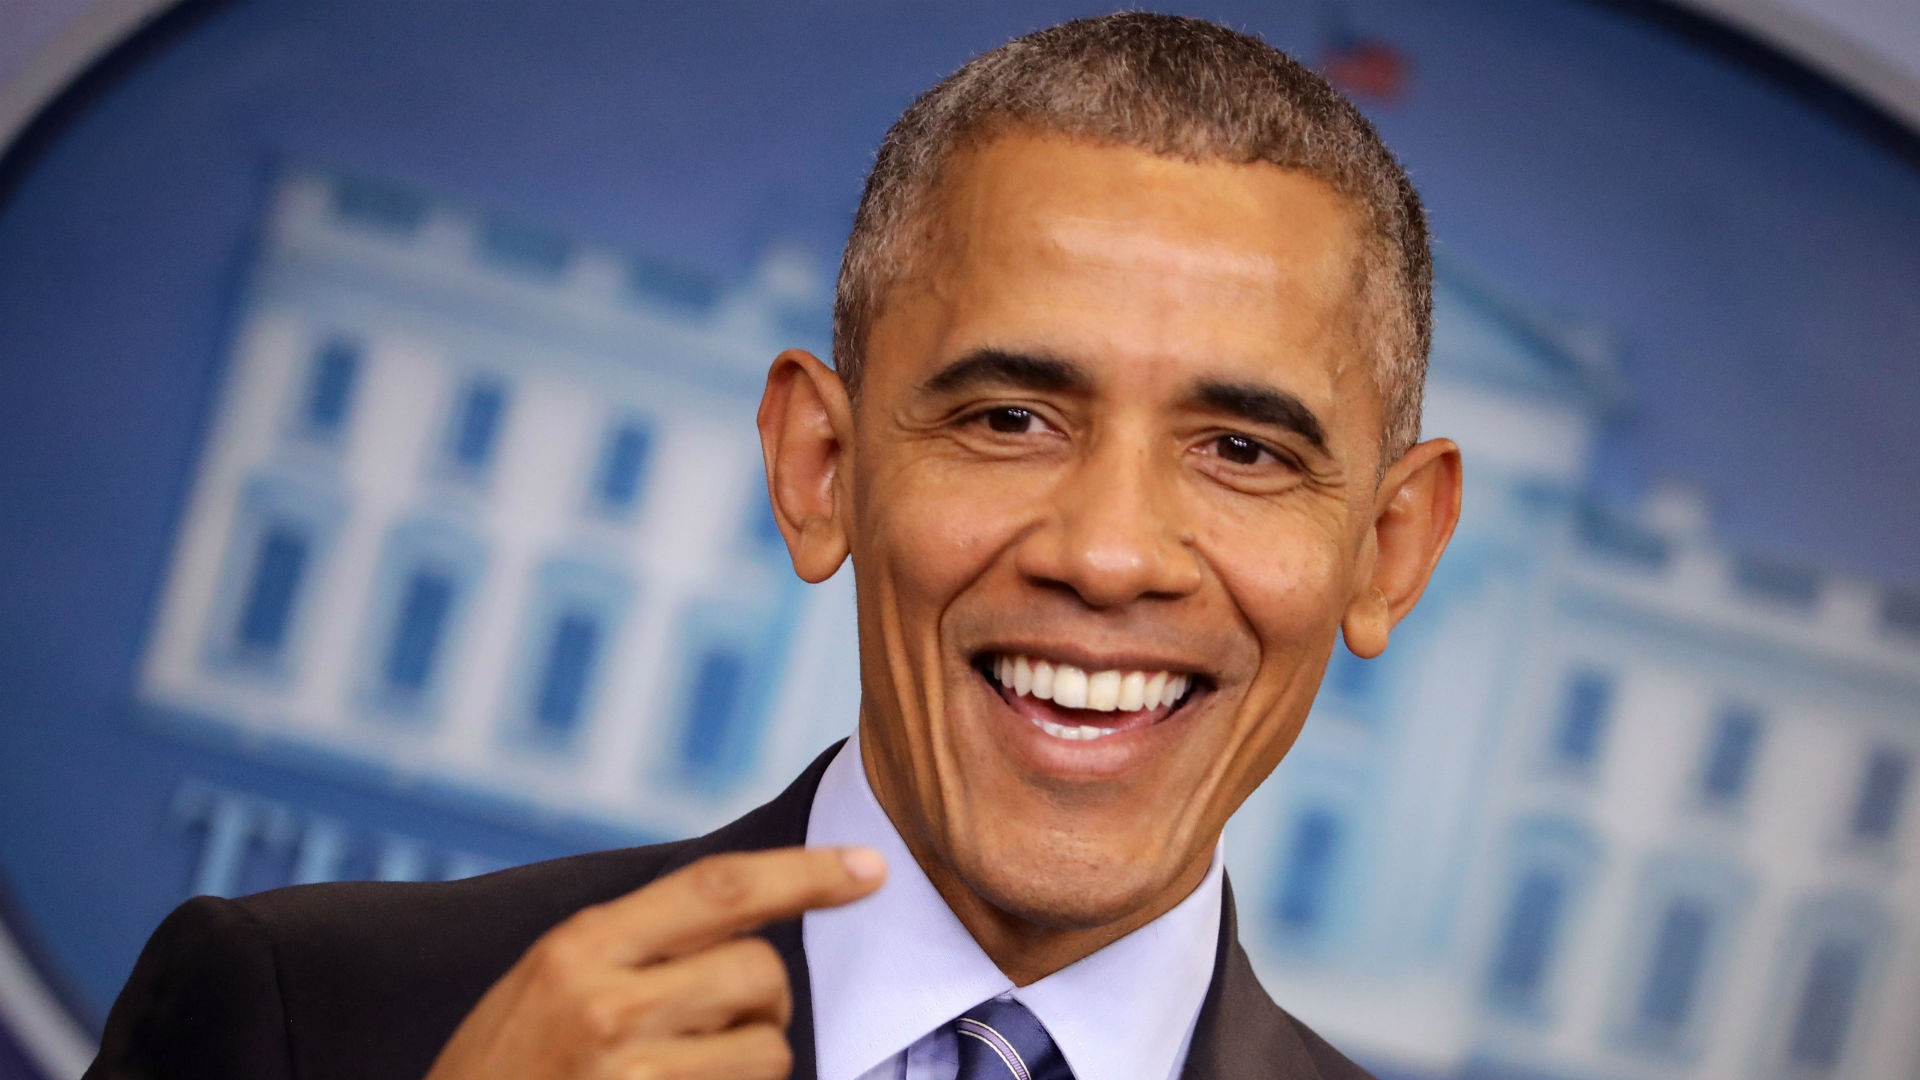 Barack Obama's March Madness bracket 2021: Former president picks Gonzaga, Baylor to win NCAA tournaments